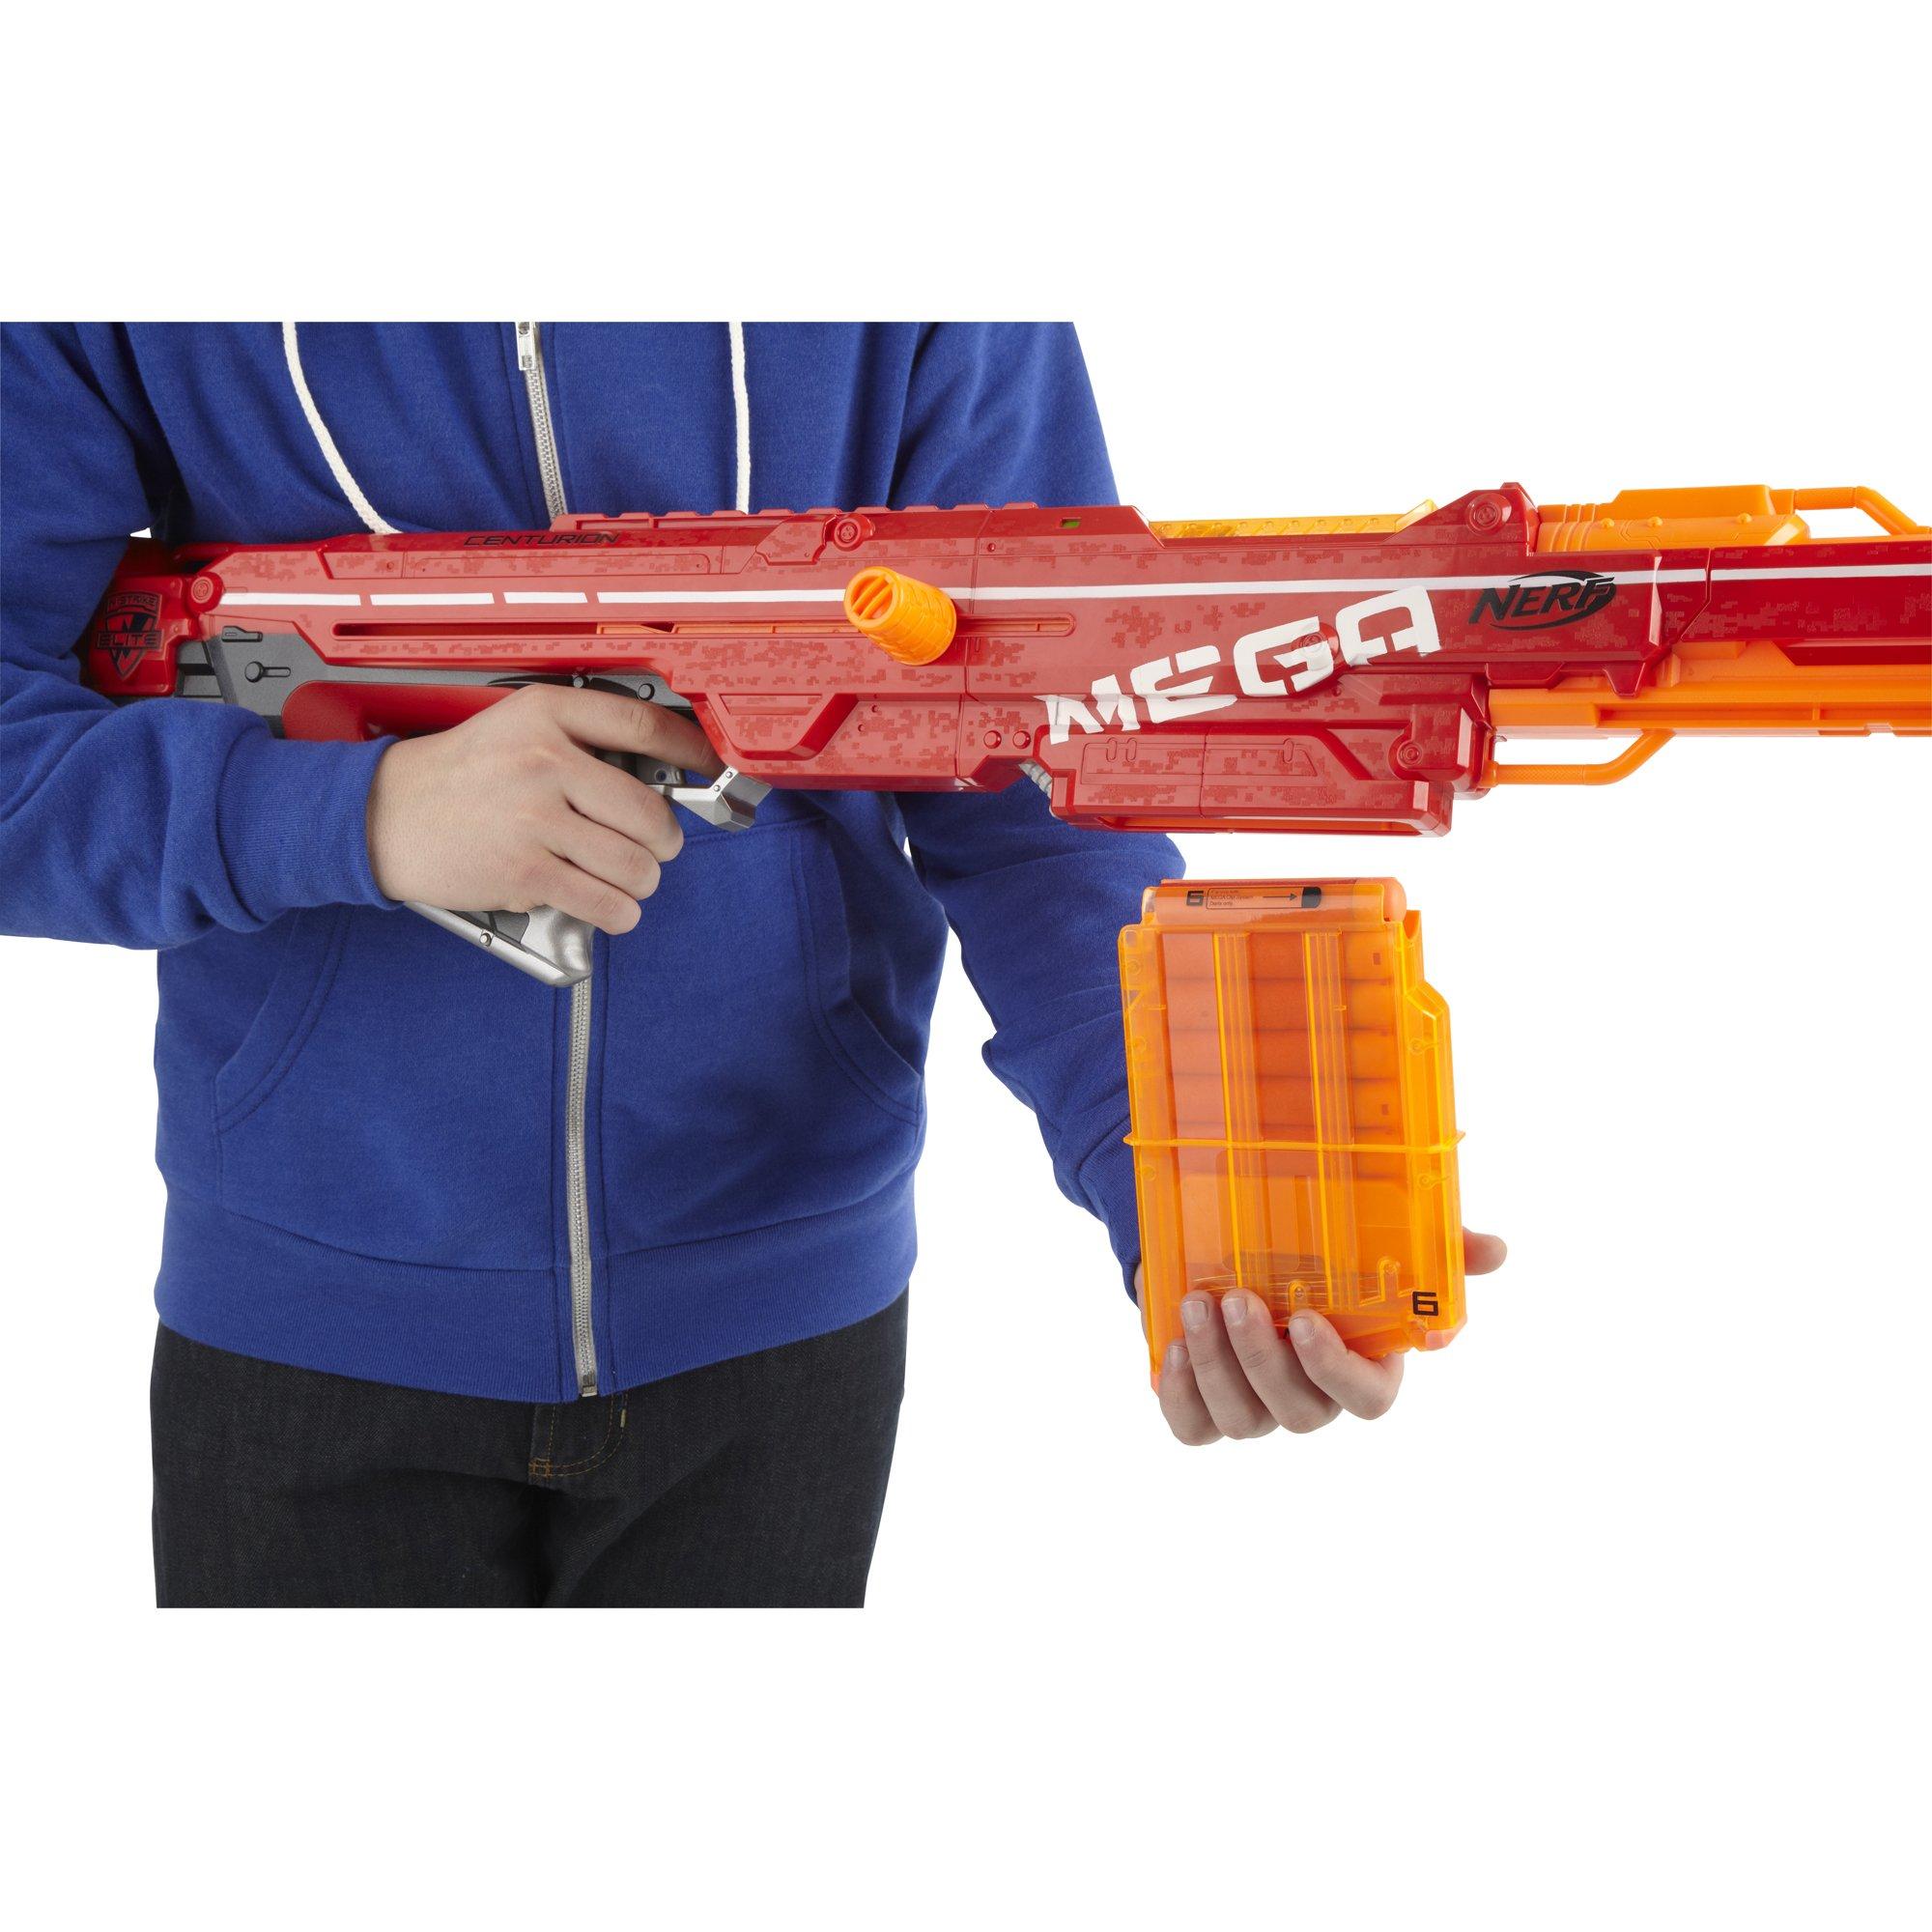 Nerf N-Strike Elite Centurion Blaster by NERF (Image #3)